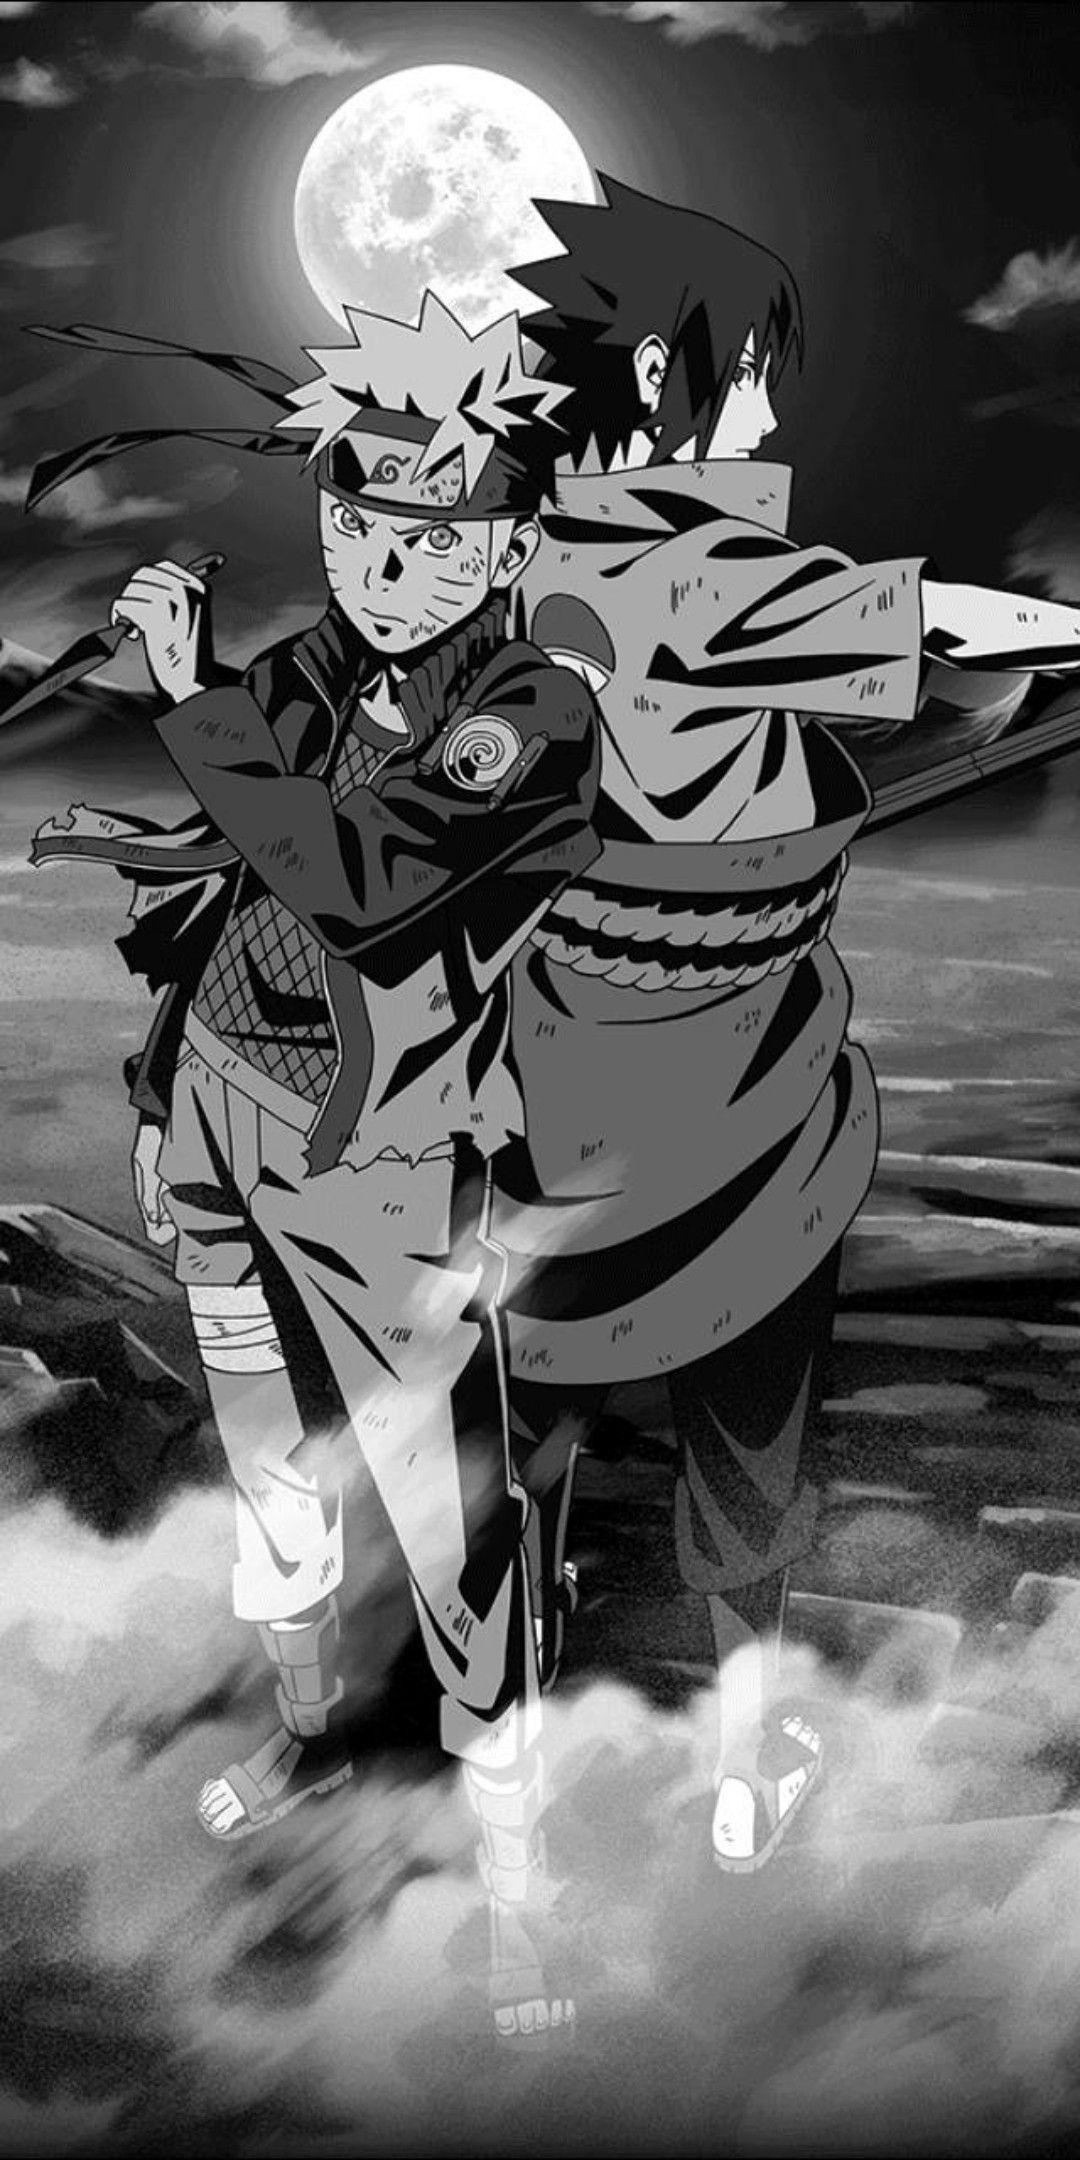 Pin By Kevine Aguie On Fond Ecran Naruto Uzumaki Art Anime Wallpaper Wallpaper Naruto Shippuden